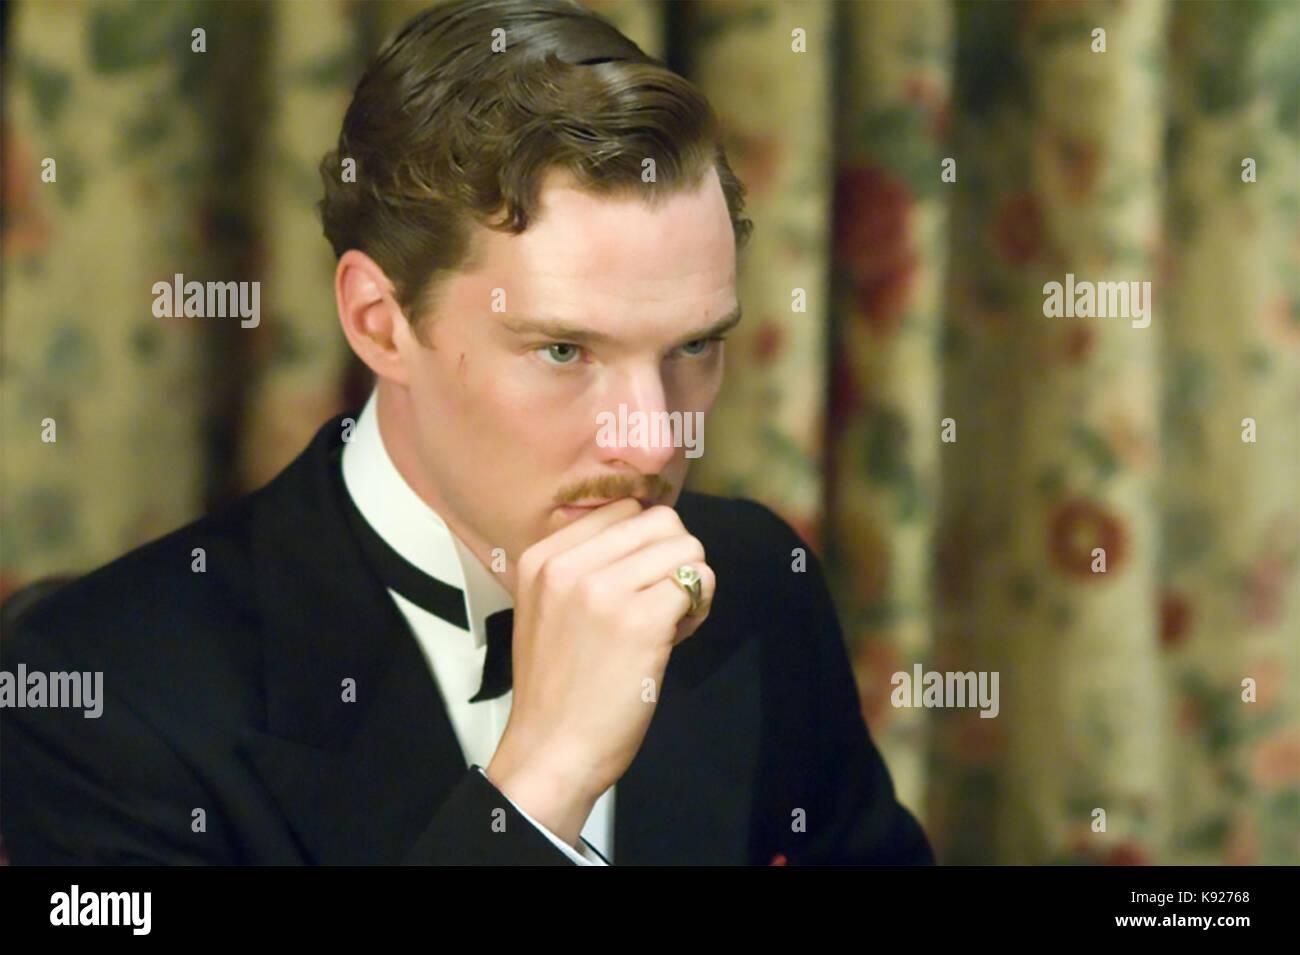 ATONEMENT 2007 Universal Pictures film with Benedict Cumberbatch - Stock Image